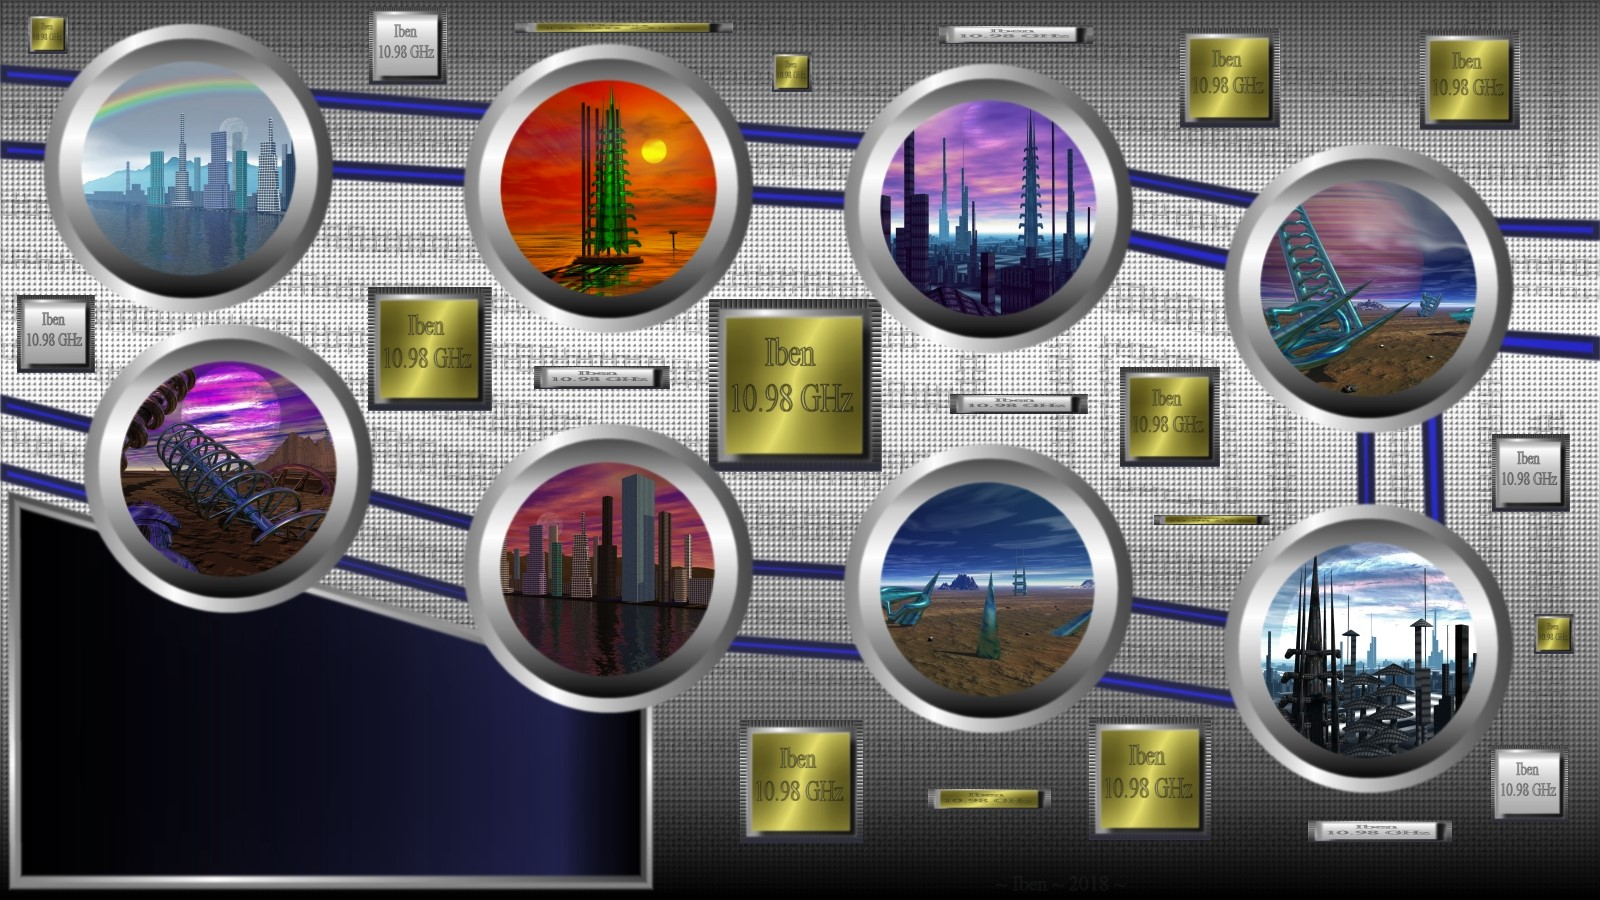 Worlds lock screen by iben1